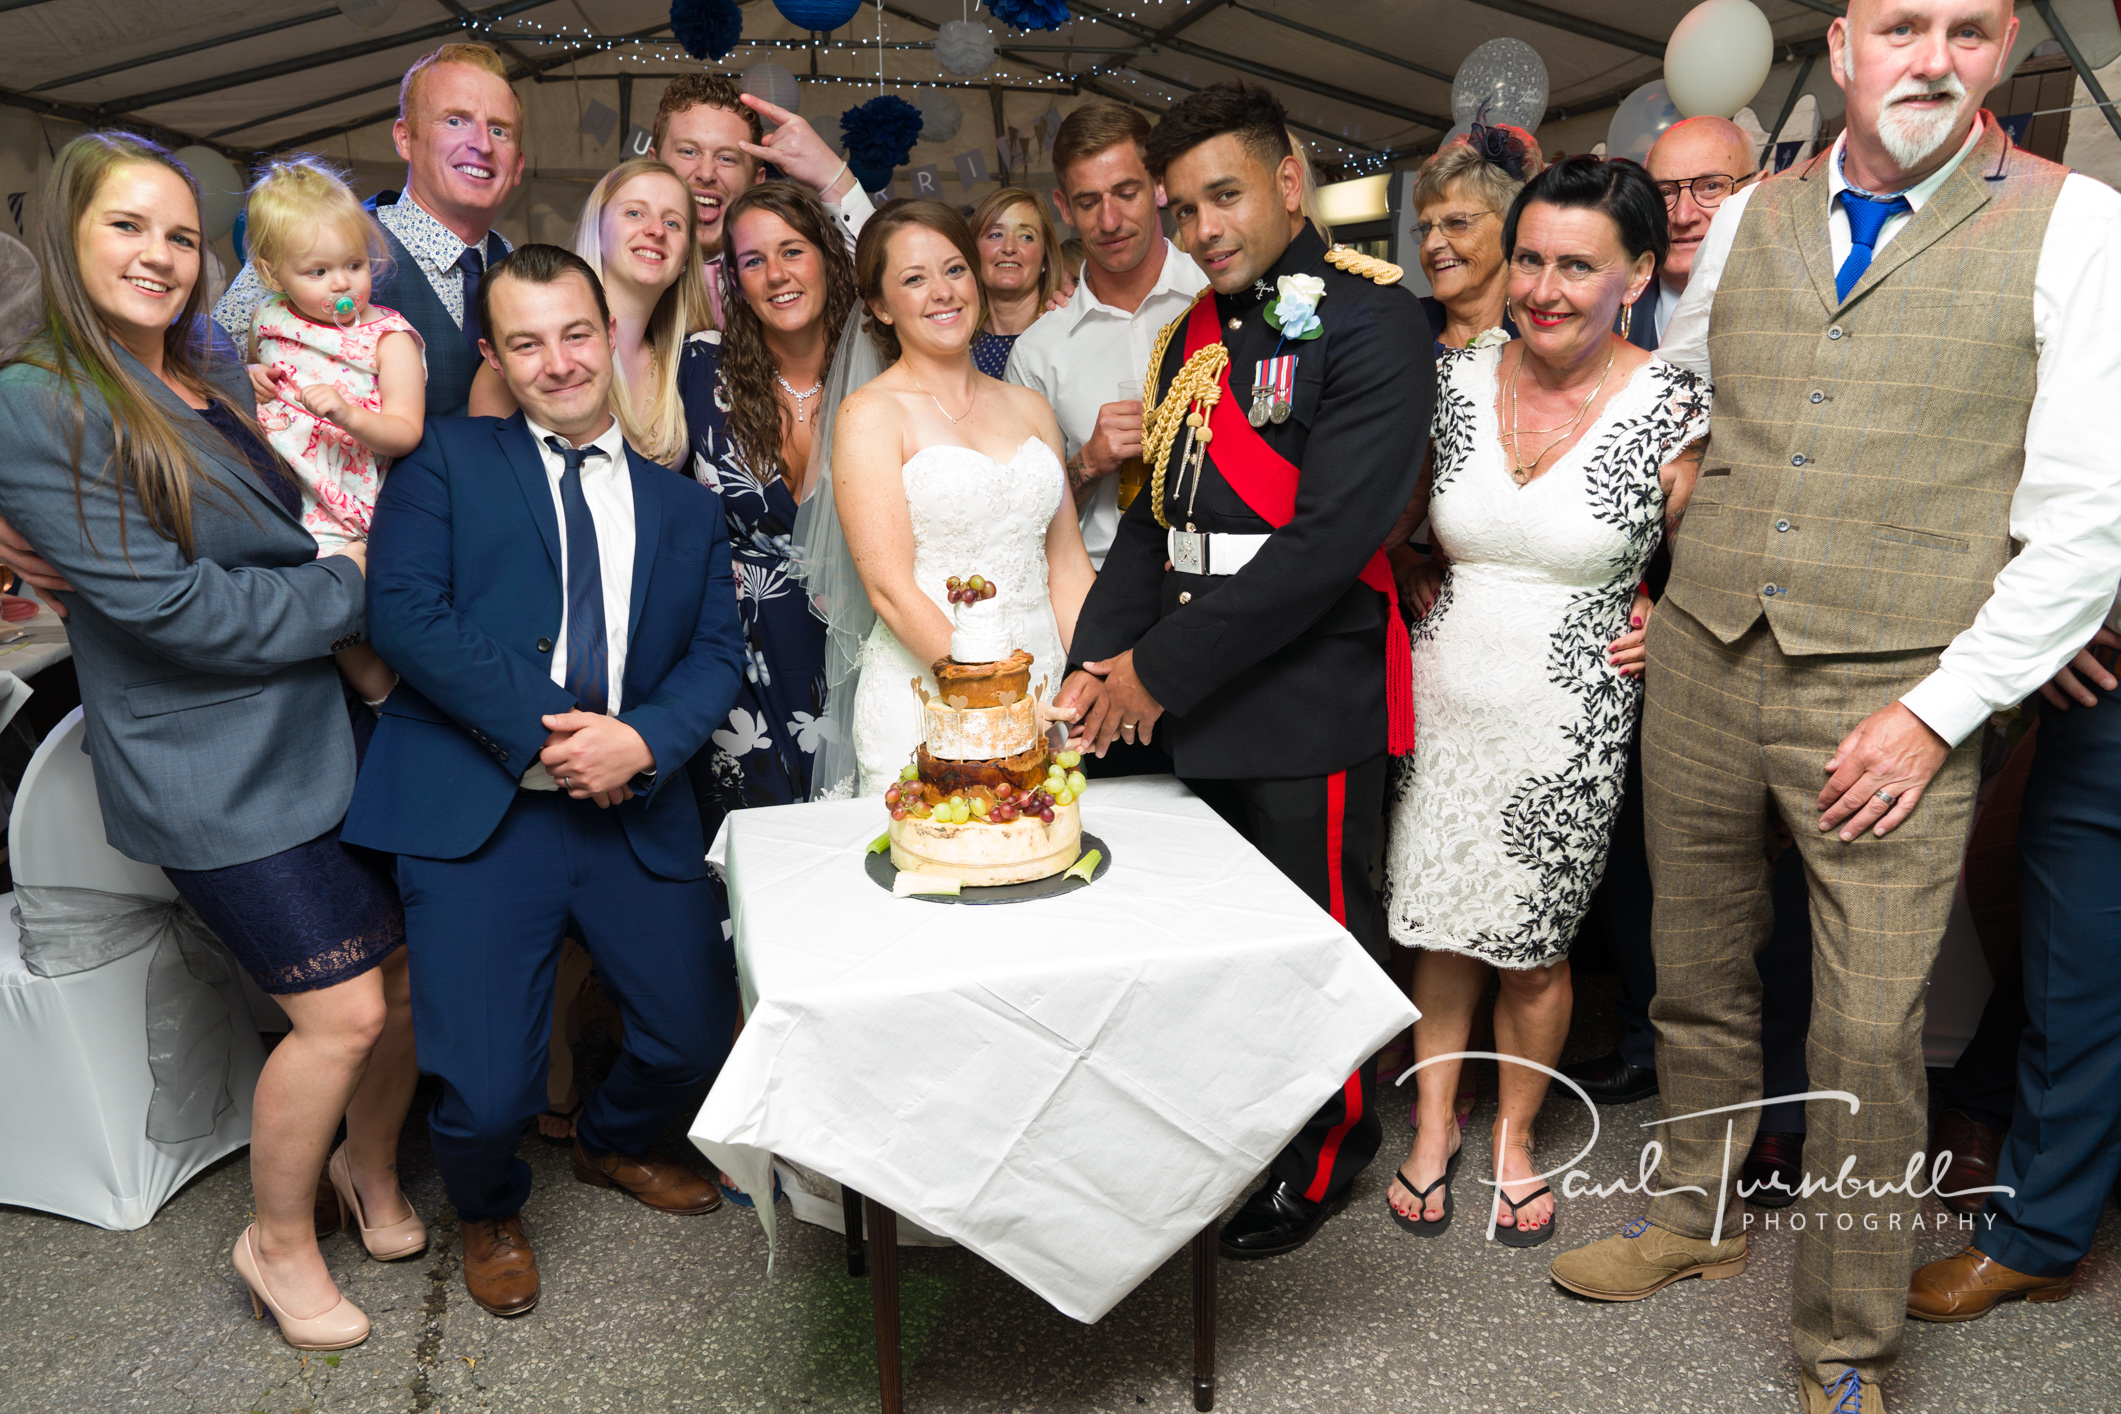 wedding-photographer-south-dalton-walkington-yorkshire-emma-james-078.jpg